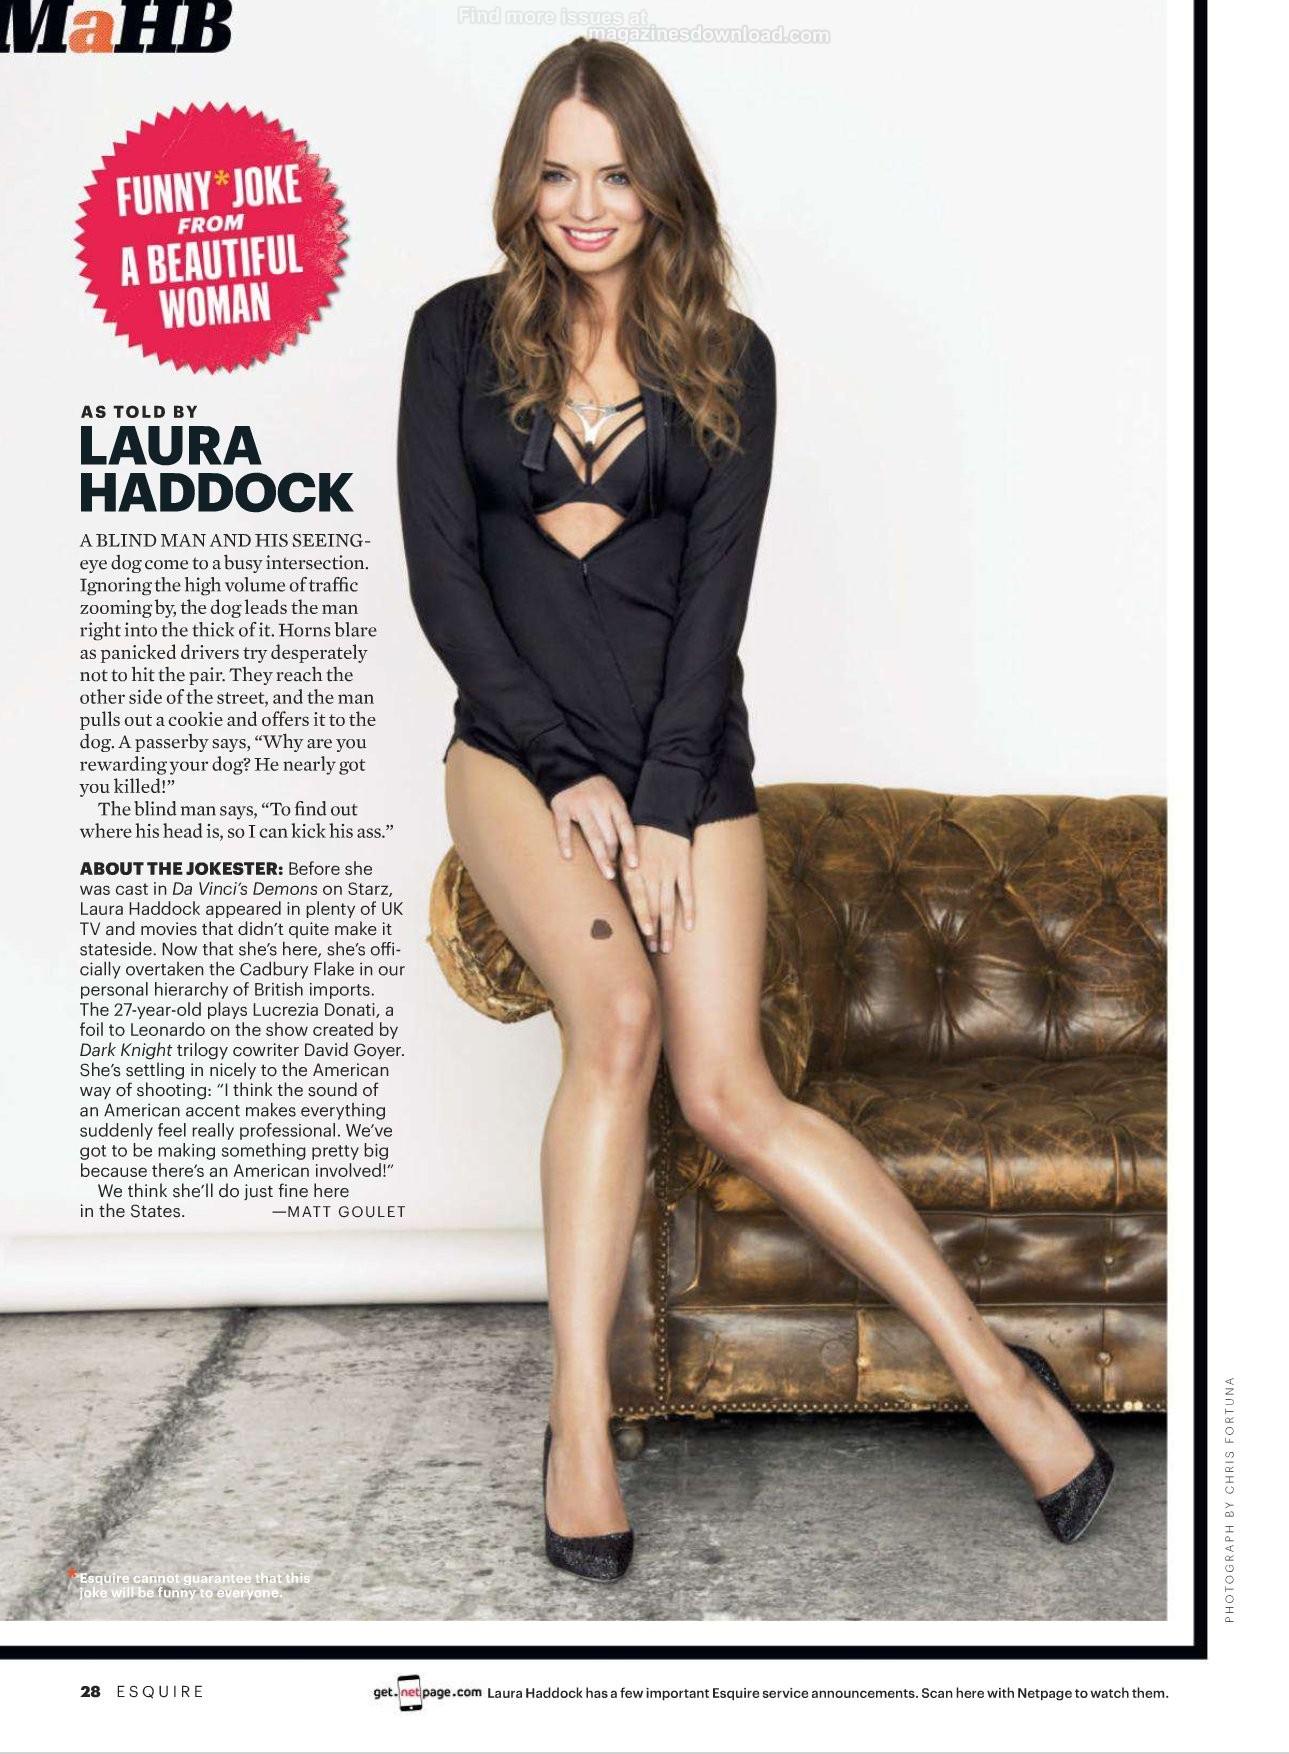 May 2013 Fashion Magazine Covers: Laura Haddock - Esquire - May 2013-01